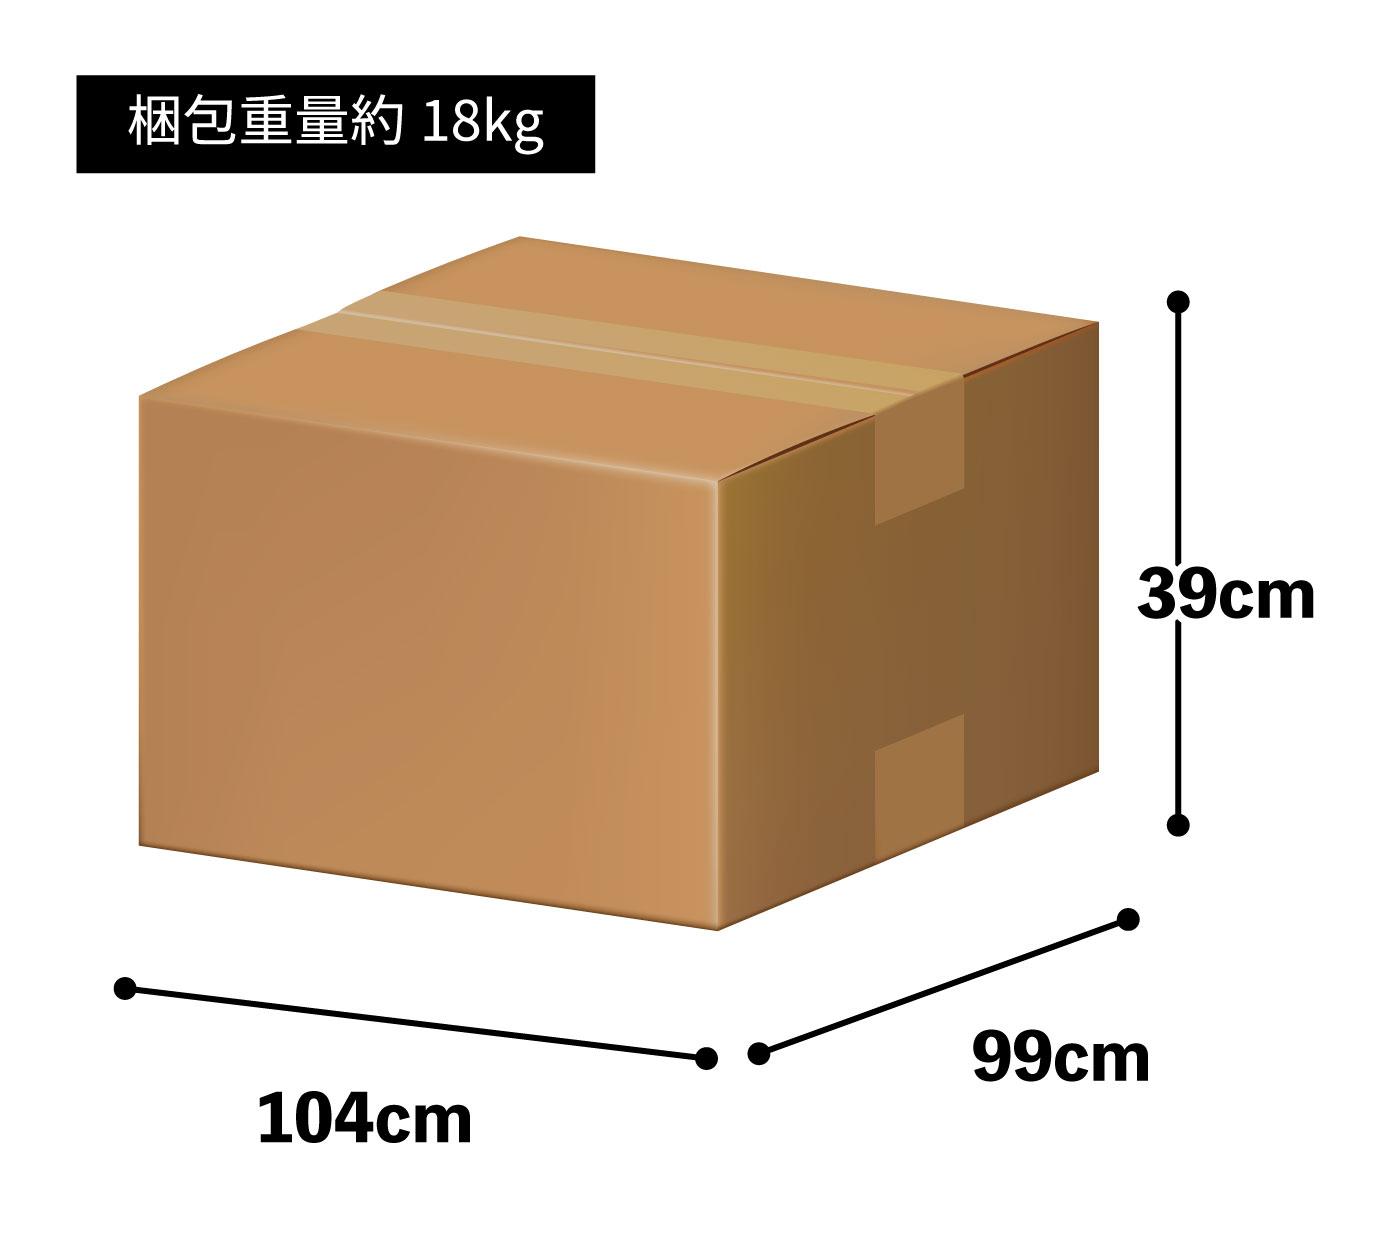 DK-6059の梱包サイズ�